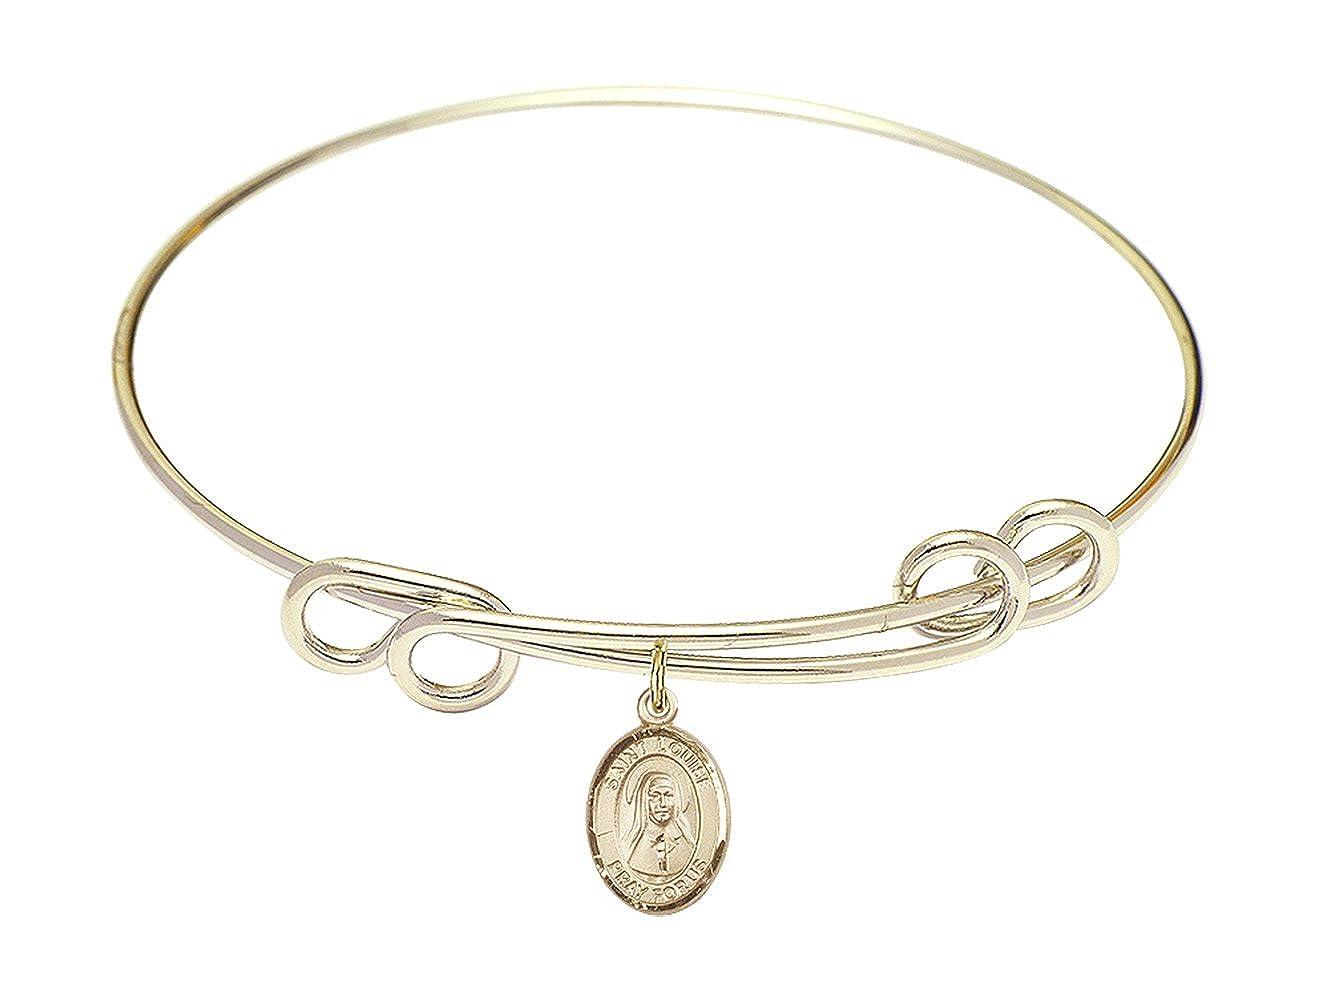 DiamondJewelryNY Double Loop Bangle Bracelet with a St Louise de Marillac Charm.